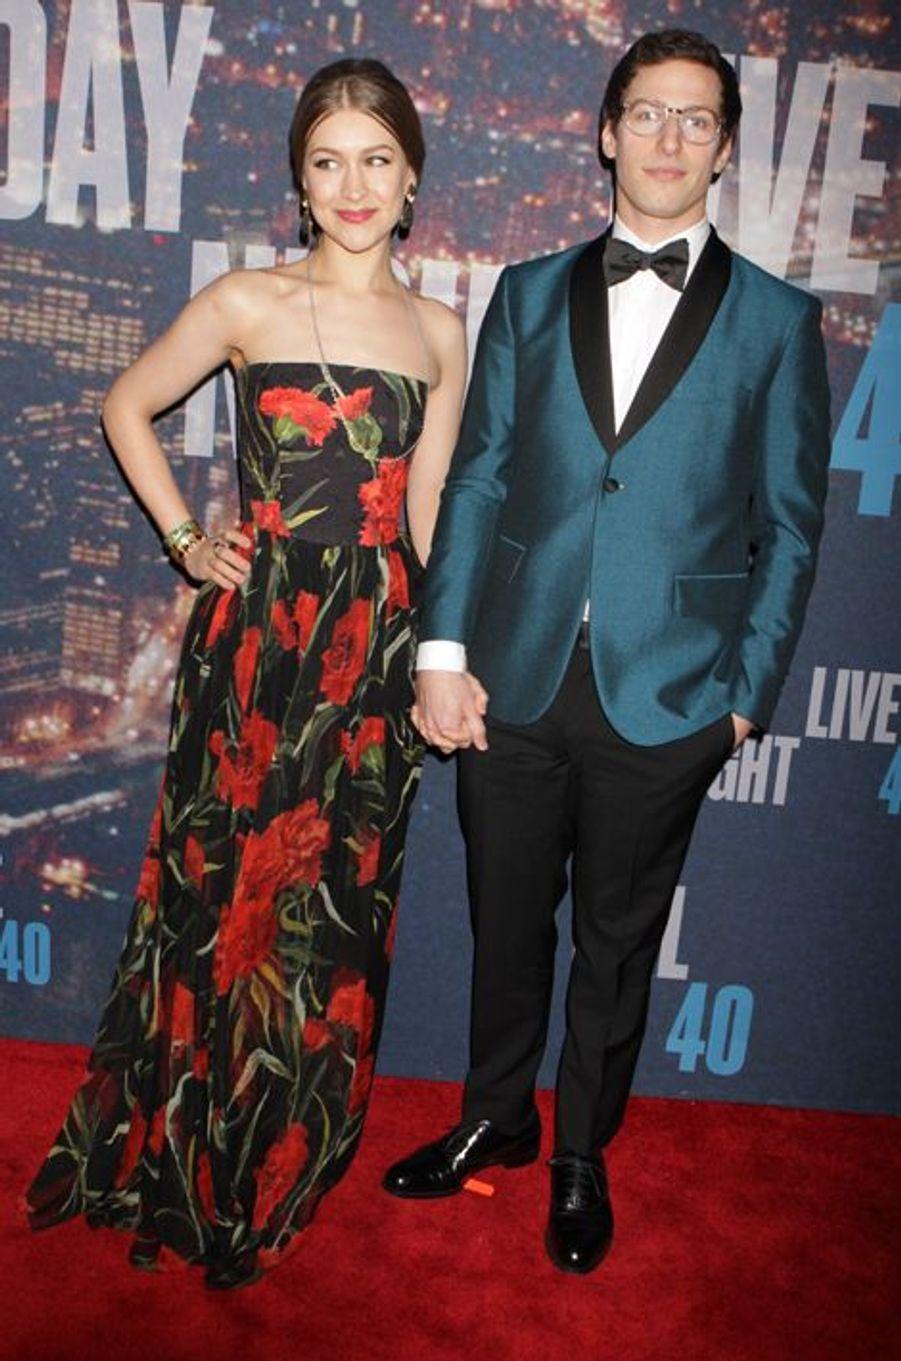 Andy Samberg et sa compagne Joanna à New York le 15 février 2015